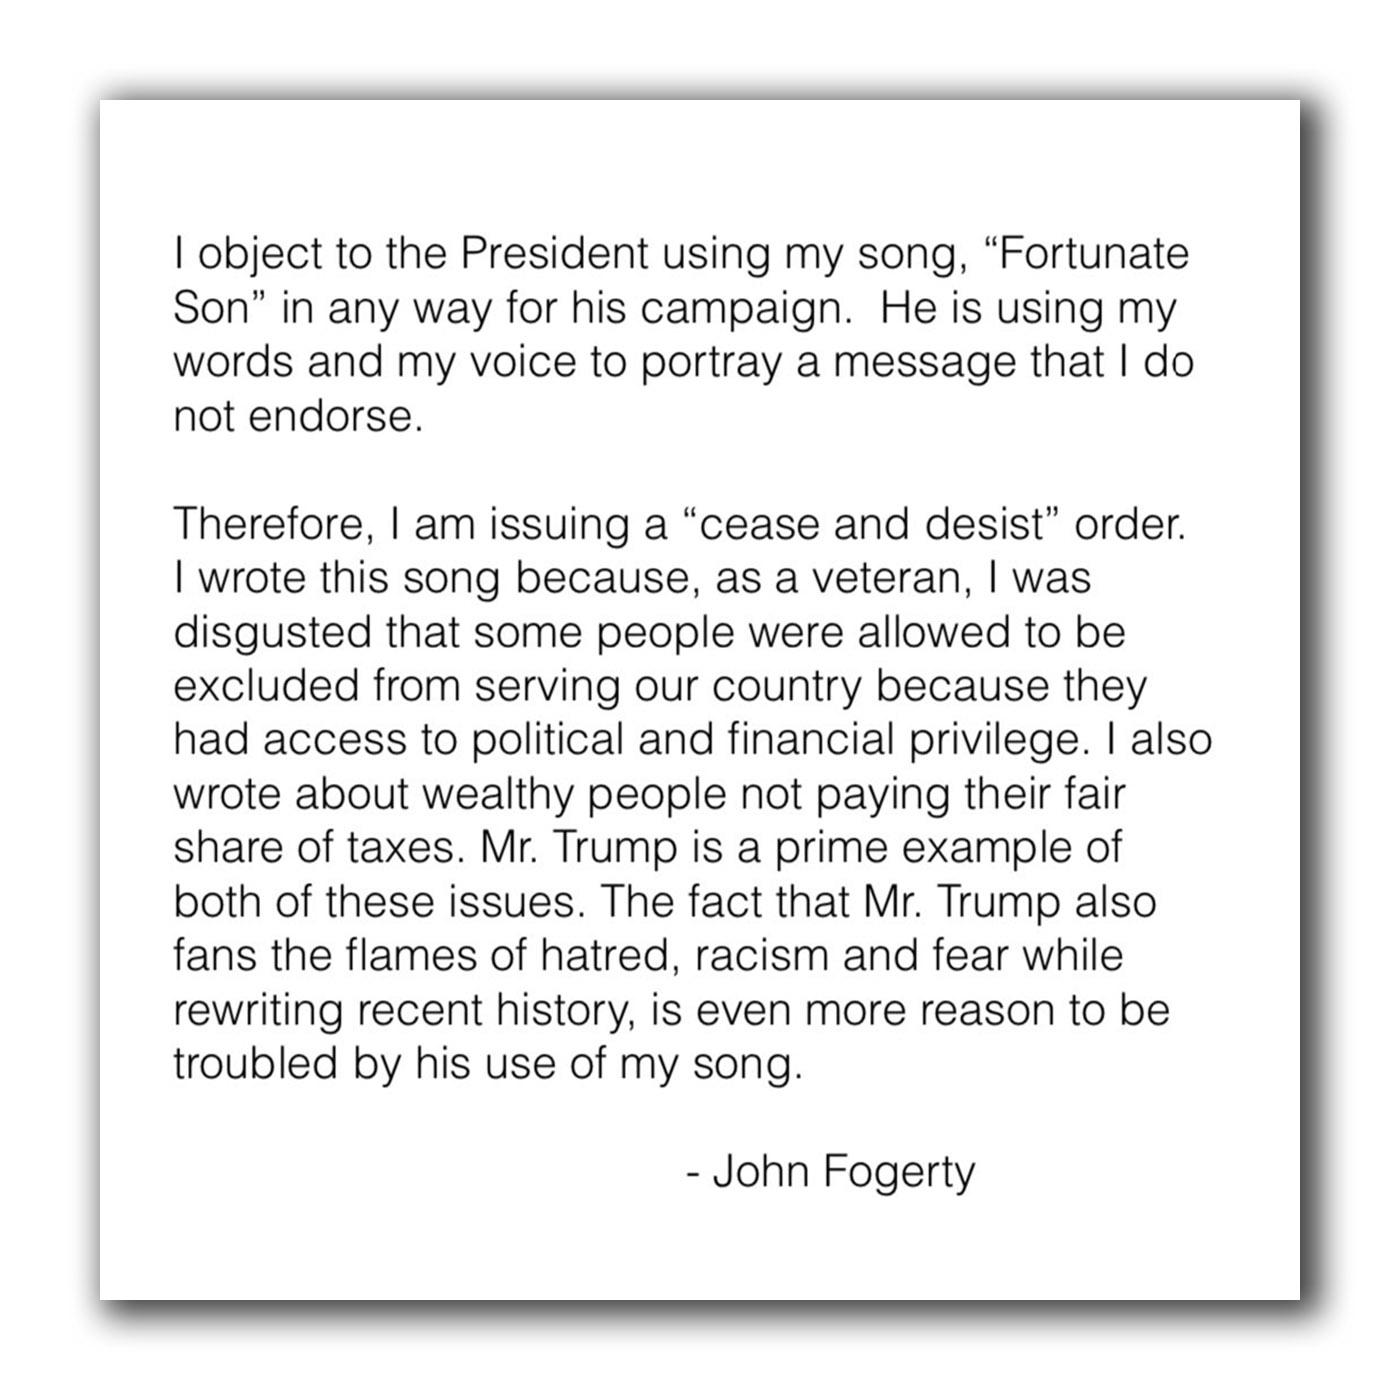 John Fogerty Letter Cease and Desist